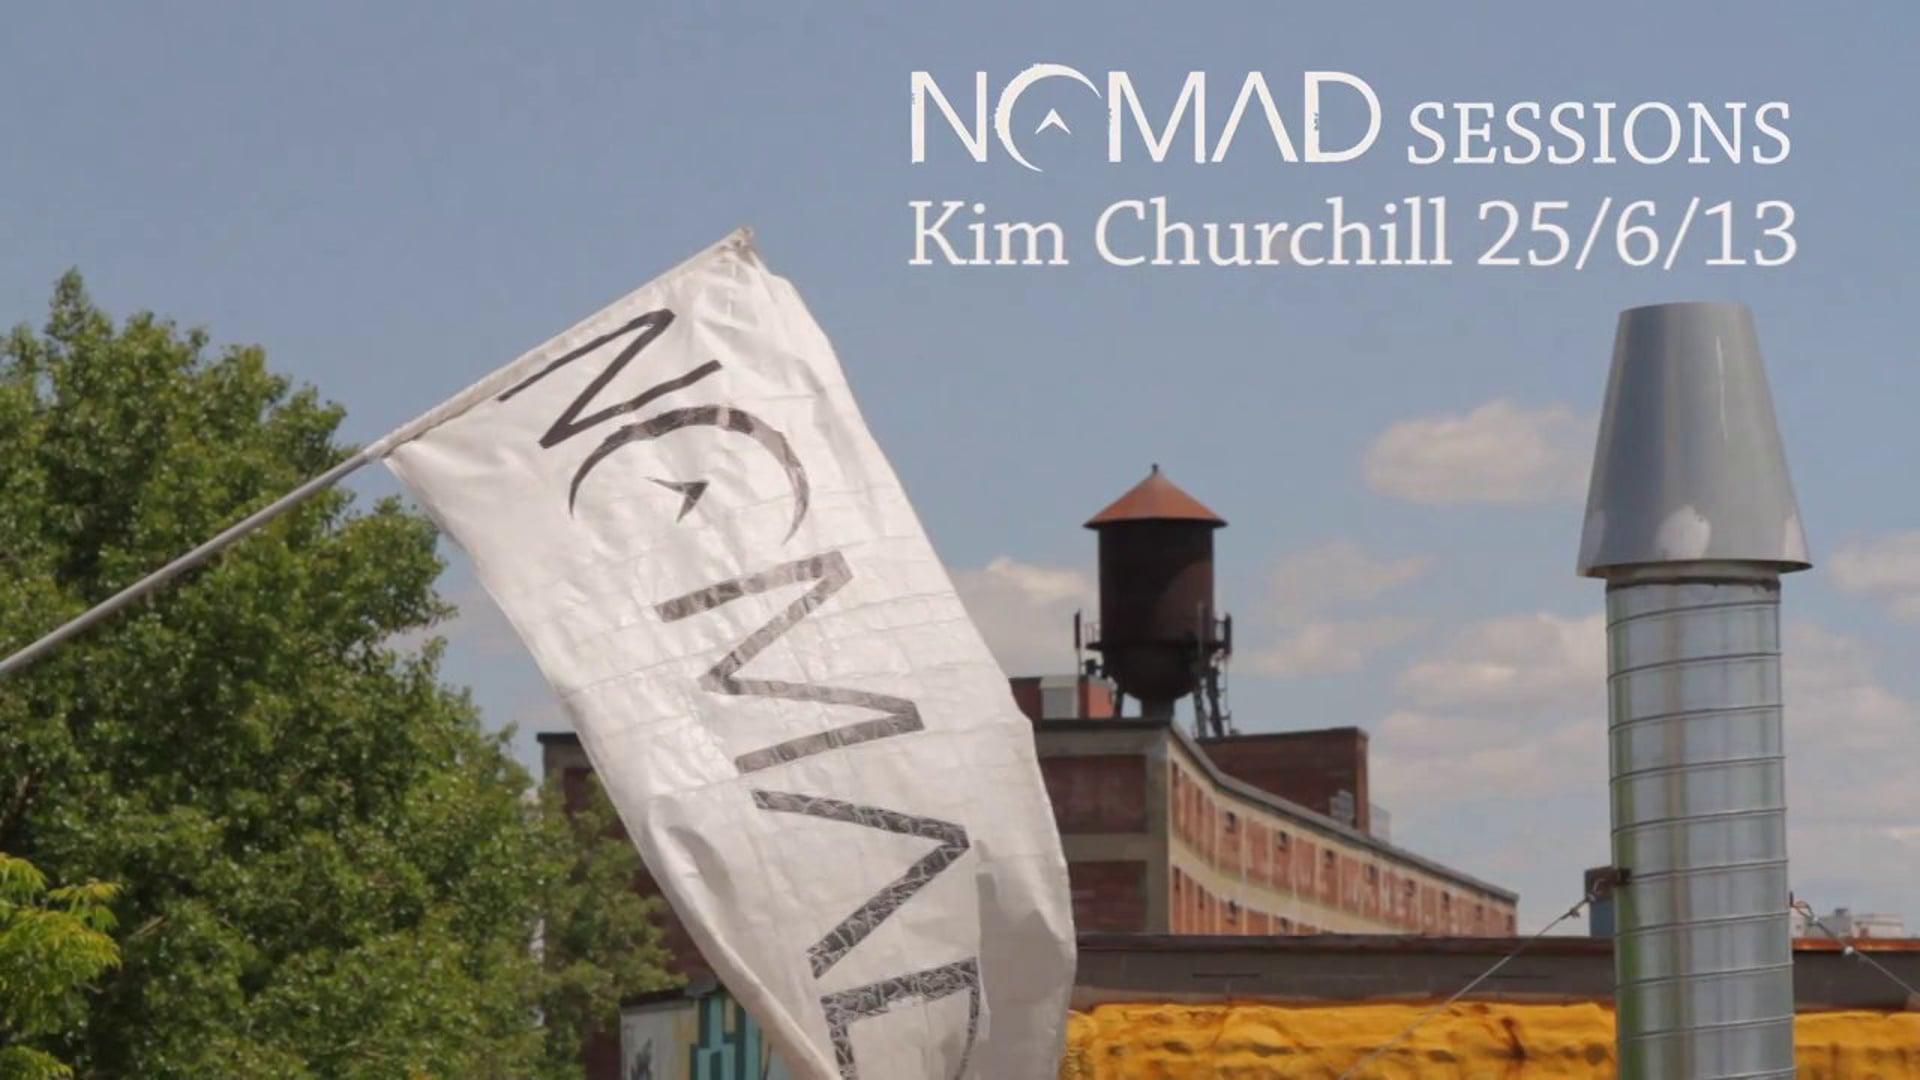 NOMAD Sessions 25/5/13 Kim Churchill